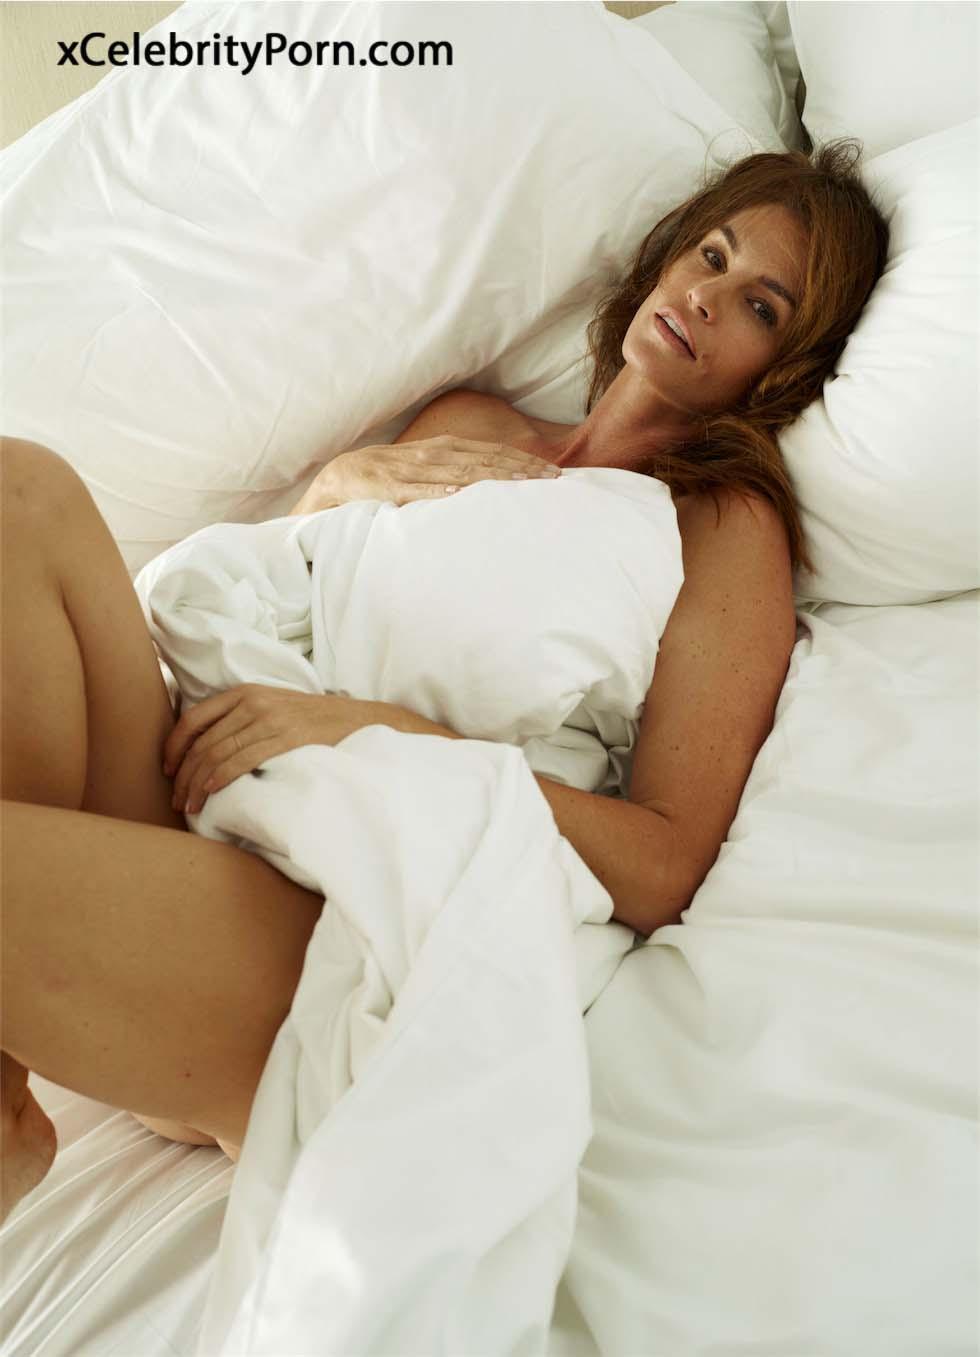 Fotografis xxx Cindy Crawford - famos en playboy fotos xxx modelos teniendo sexo-cantantes enseñando el coño-fotos xxx- videos pono HD (5)